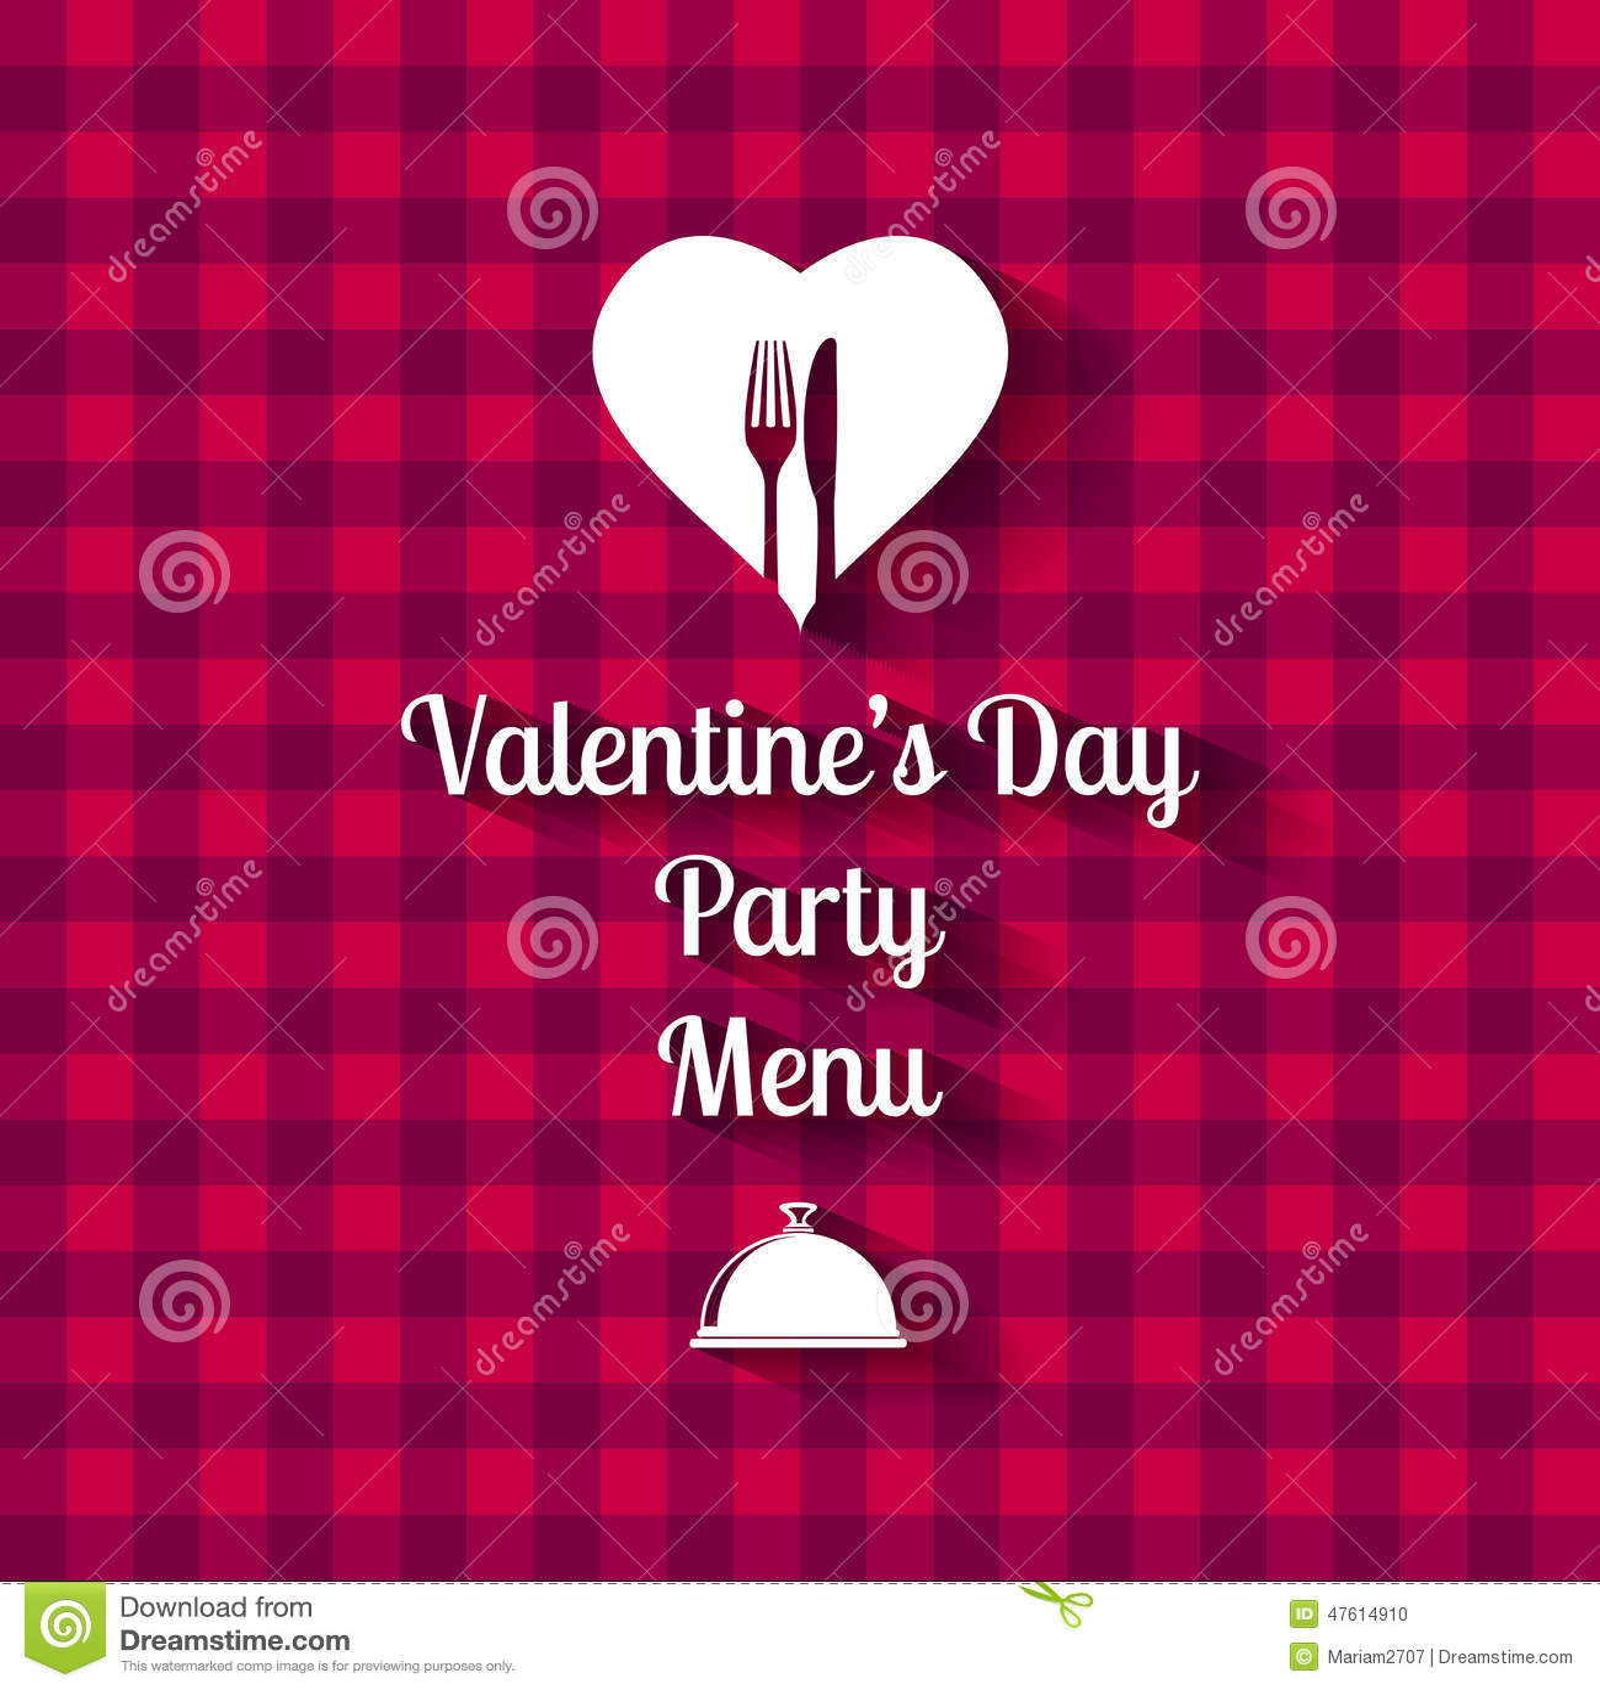 Valentines Day Dinner Menu Card Stock Vector Illustration Of Dish